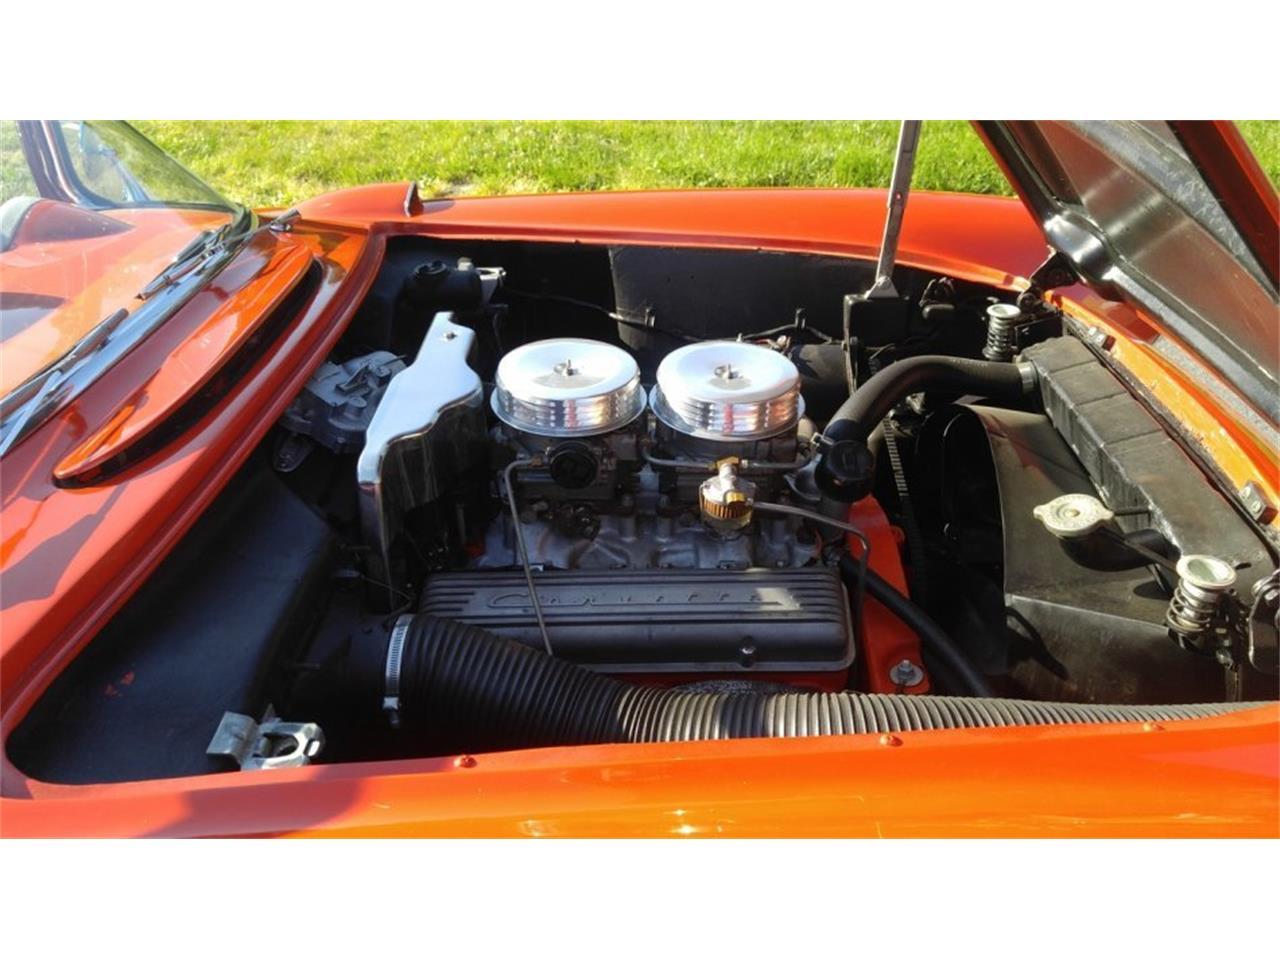 Large Picture of '56 Corvette located in Massachusetts - $59,500.00 - K3QK